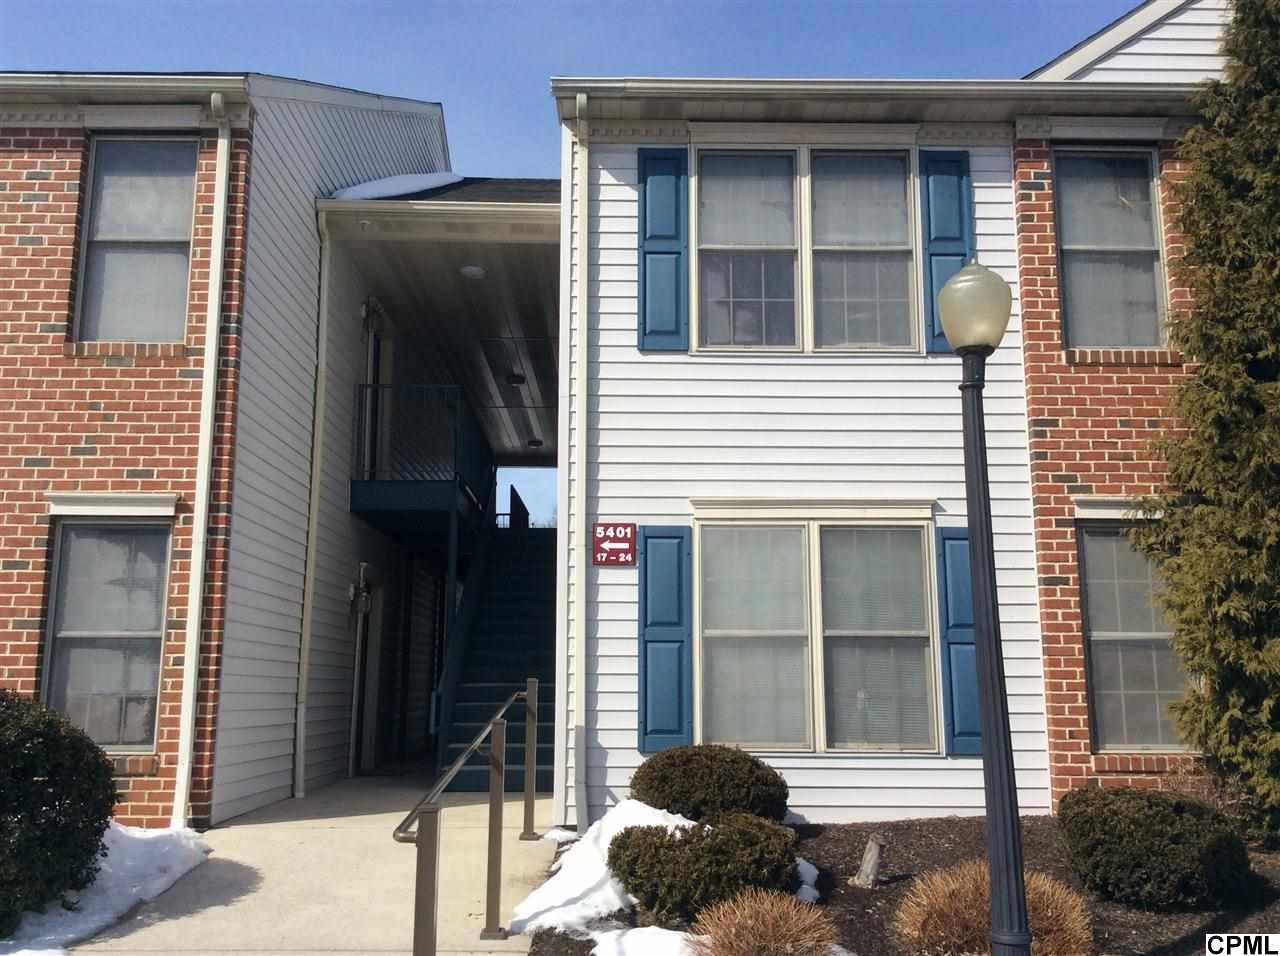 Rental Homes for Rent, ListingId:31865958, location: 5401 Oxford Drive Unit 18 Mechanicsburg 17055